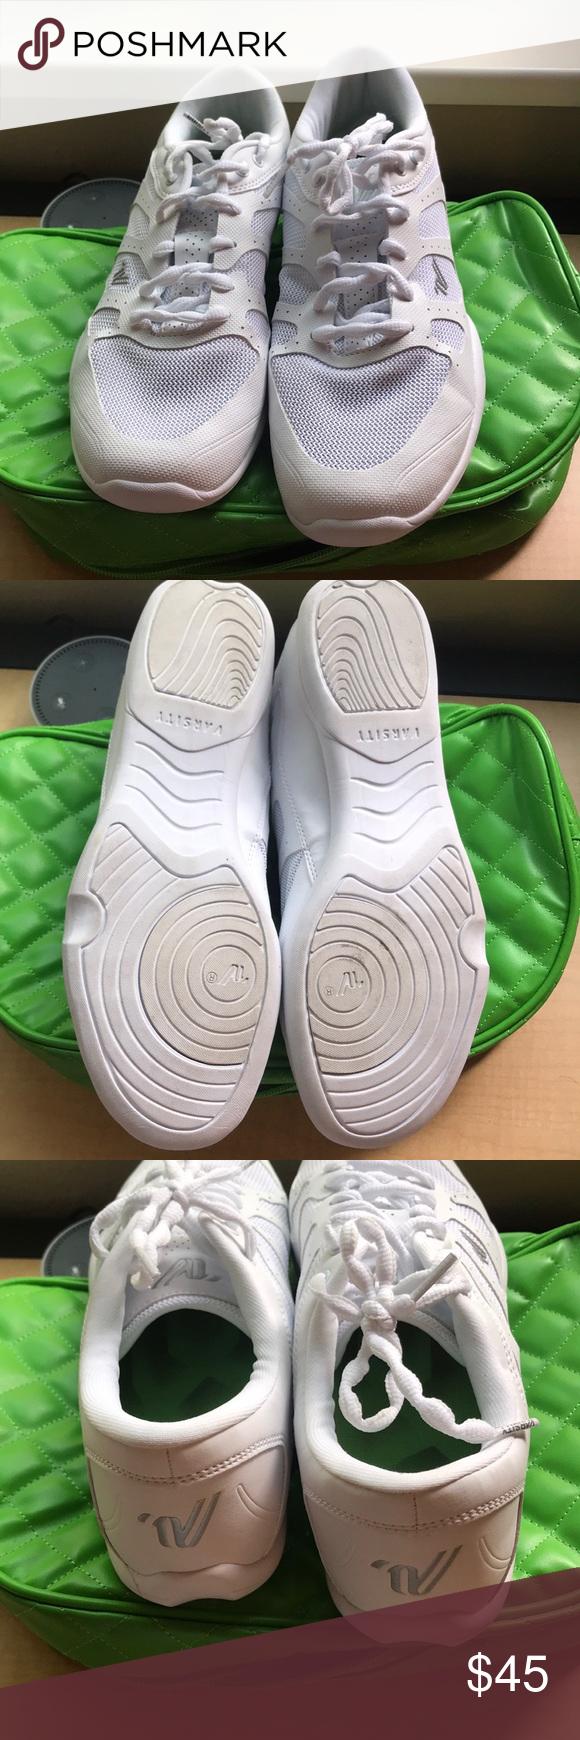 Varsity A41 cheer shoes | Cheer shoes